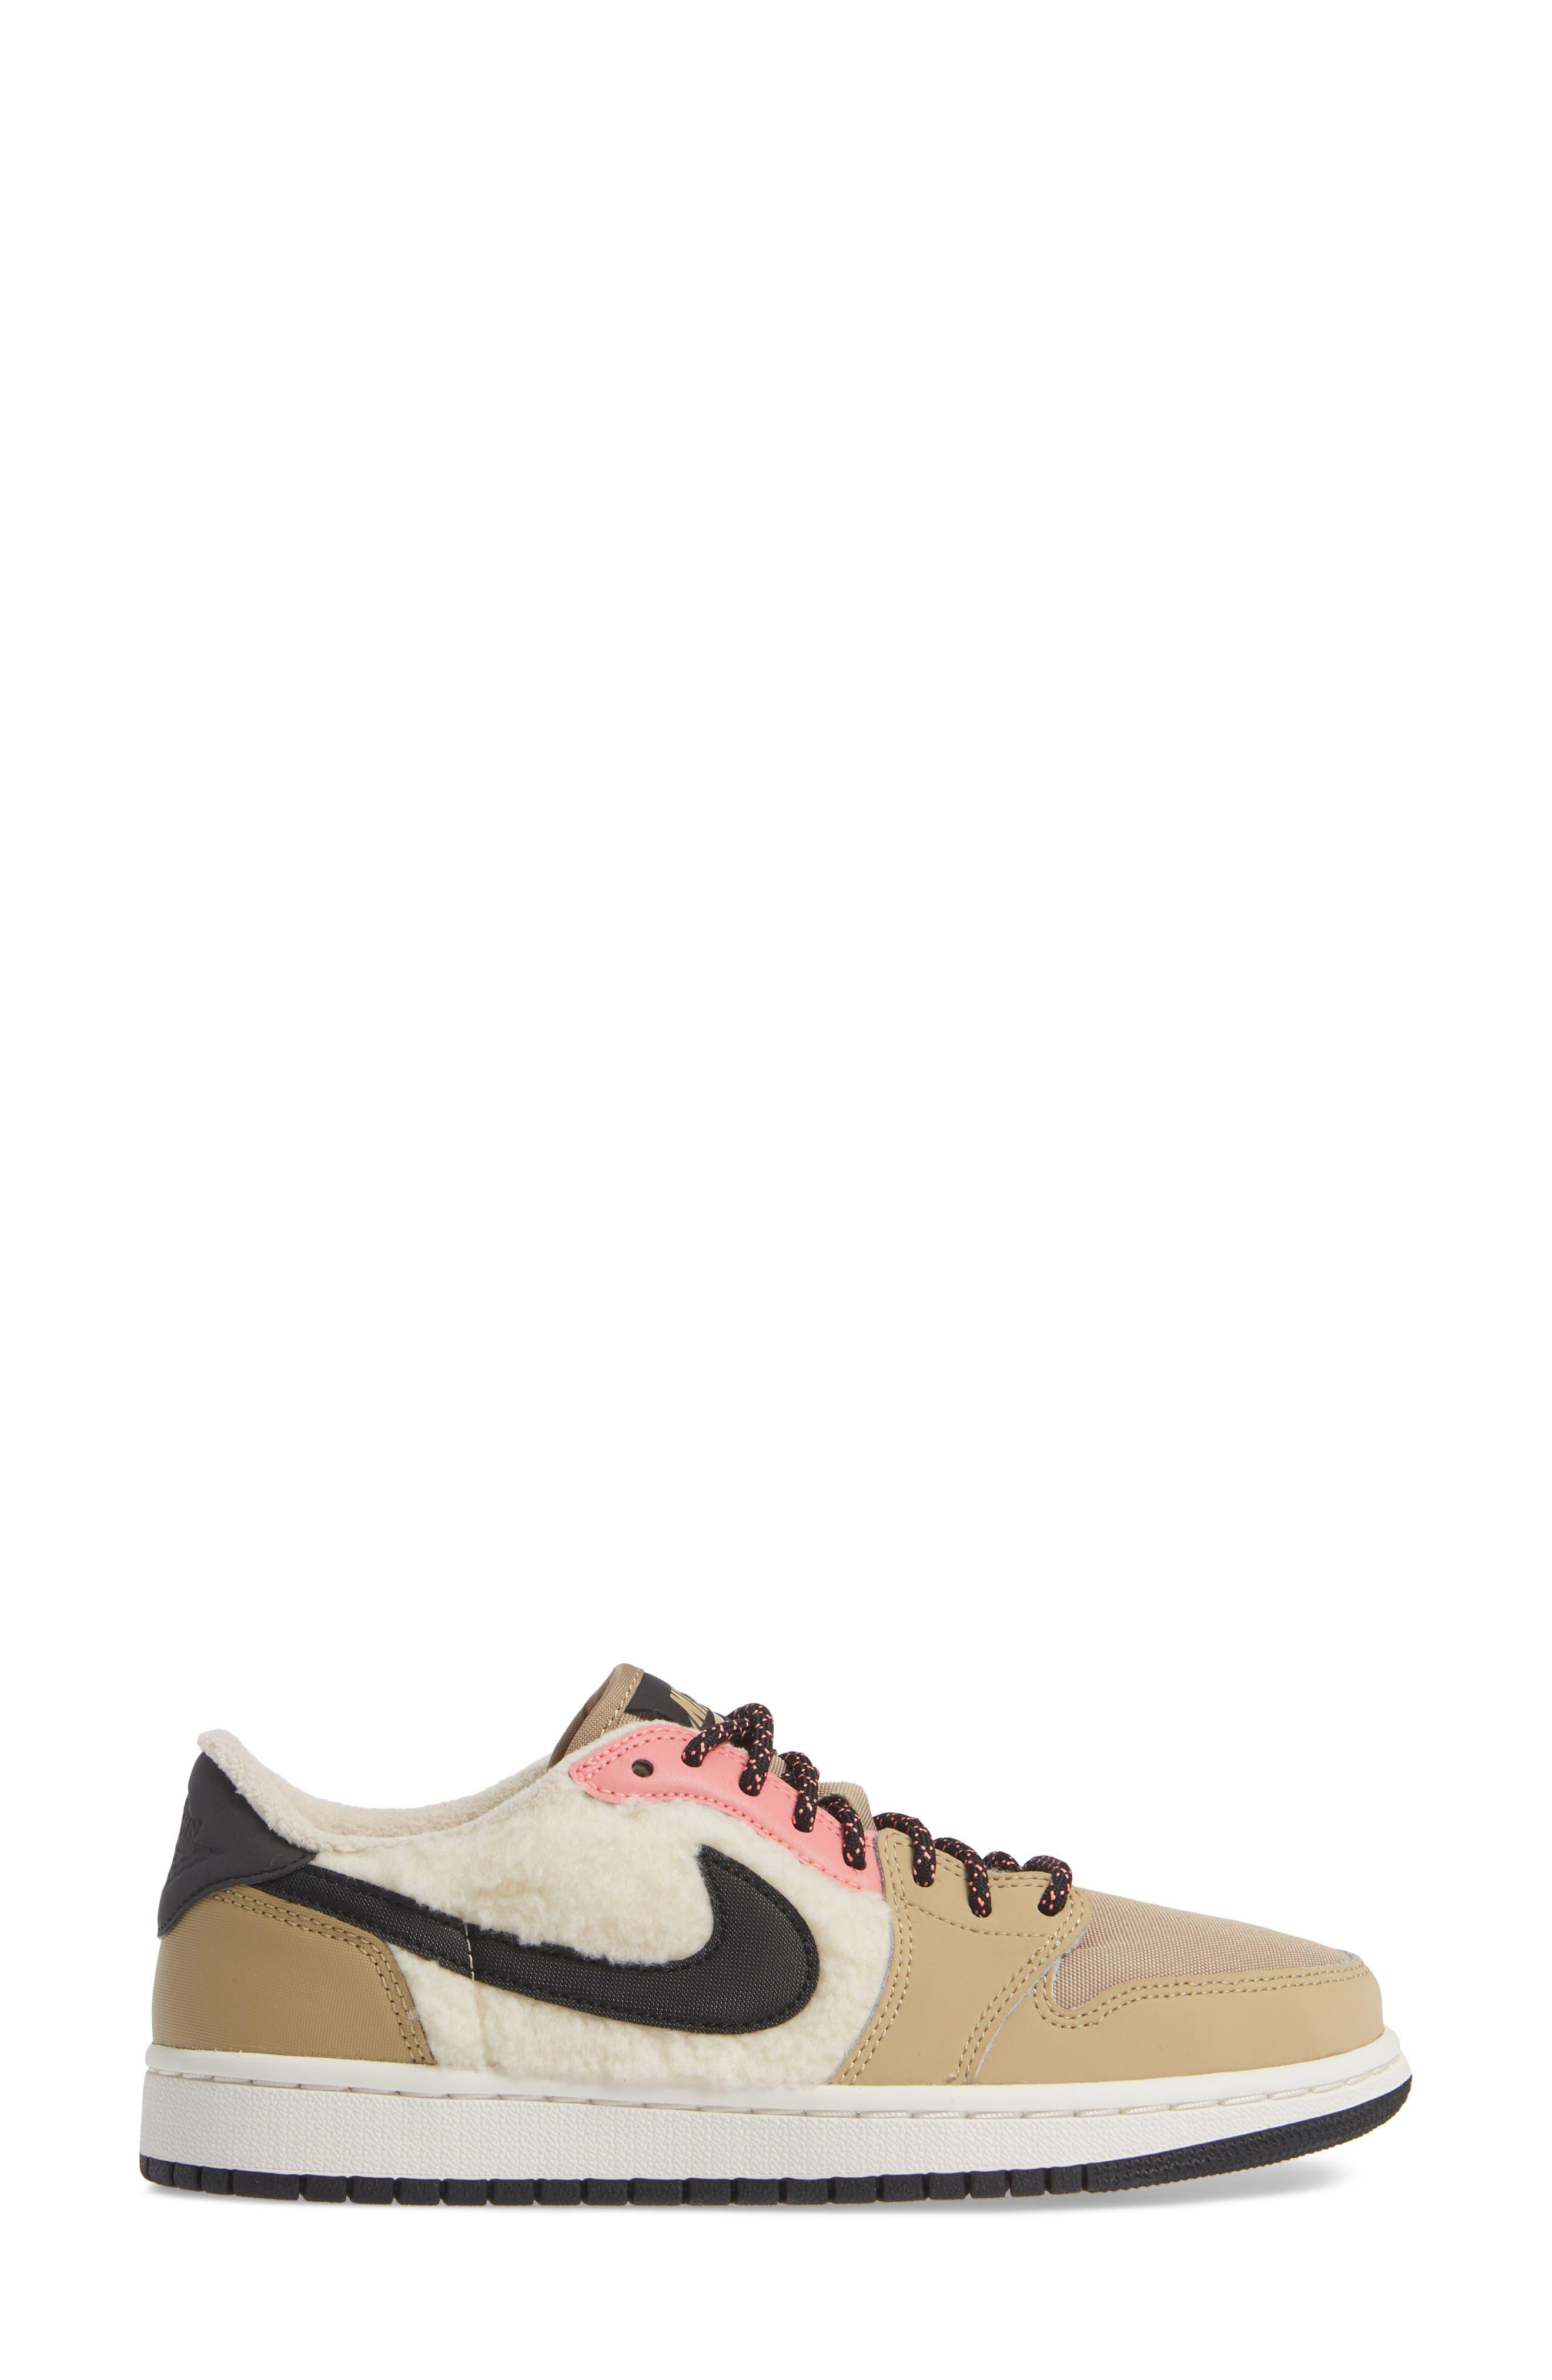 NIKE,                             Air Jordan 1 Retro Low OG Sneaker,                             Alternate thumbnail 3, color,                             200